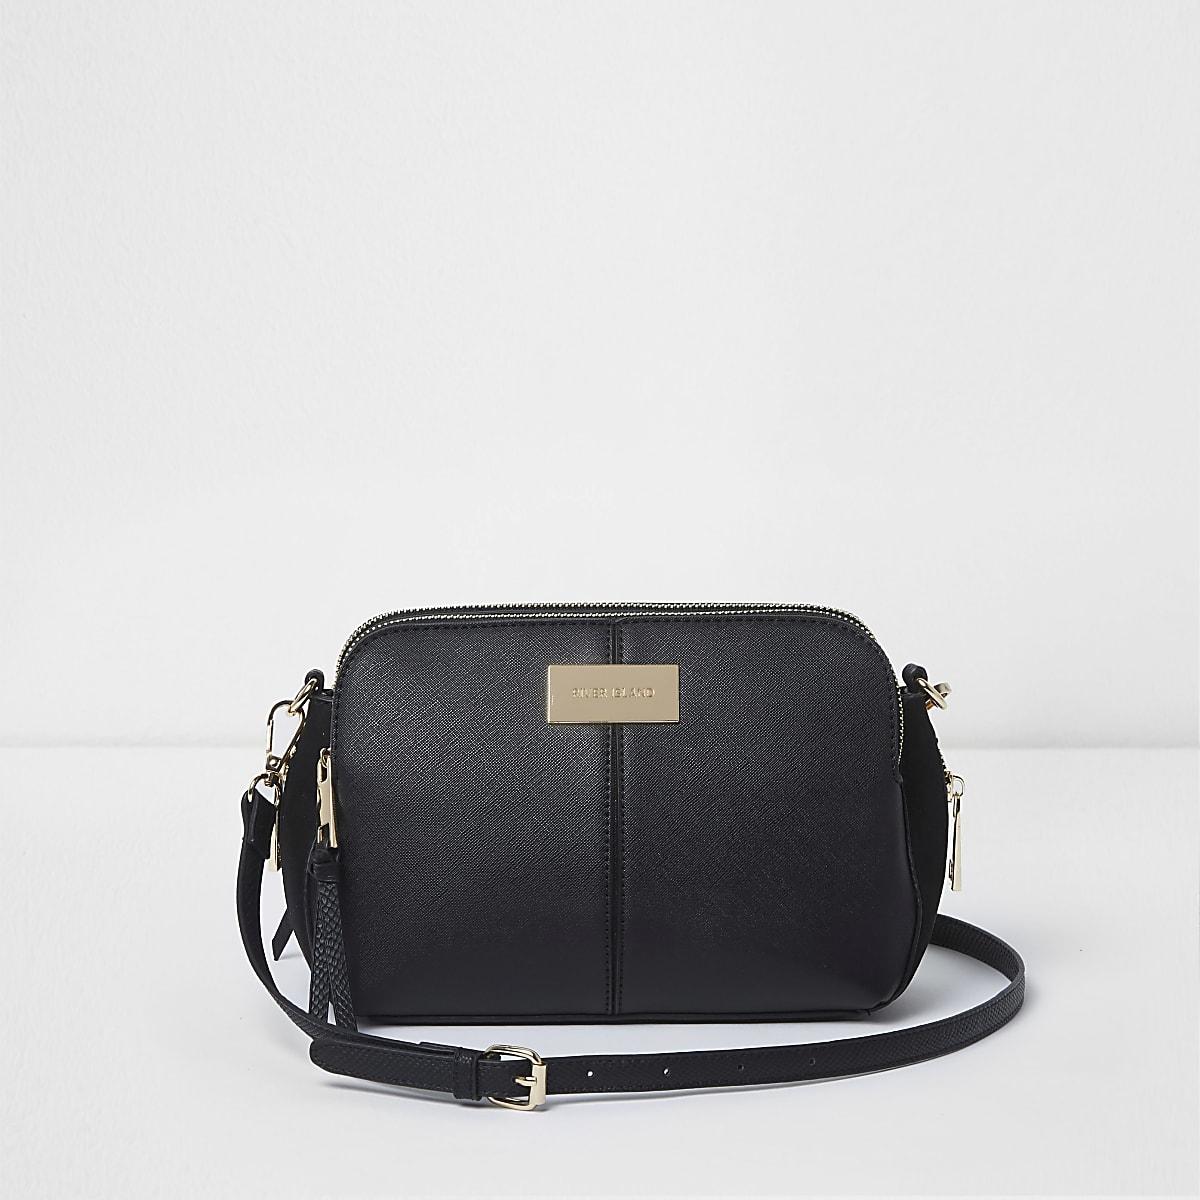 Black triple compartment cross body bag